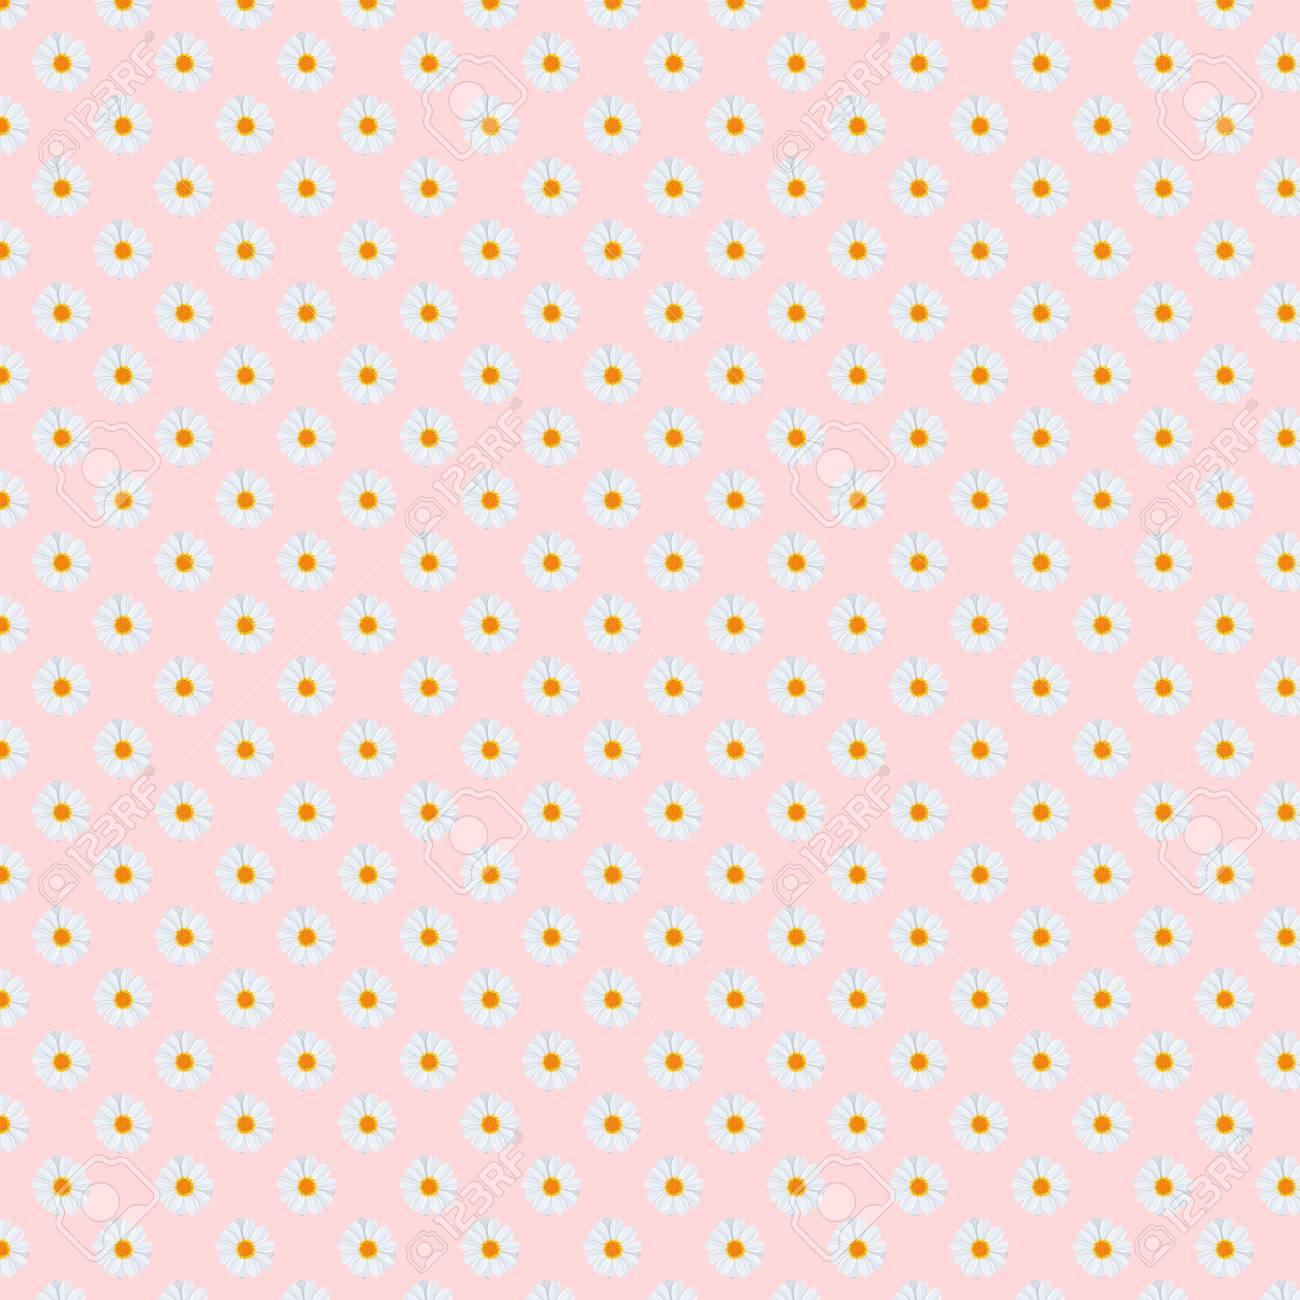 5000x5000px 300dpi Fancy Daisies Daisy Field Floral Pattern 1300x1300